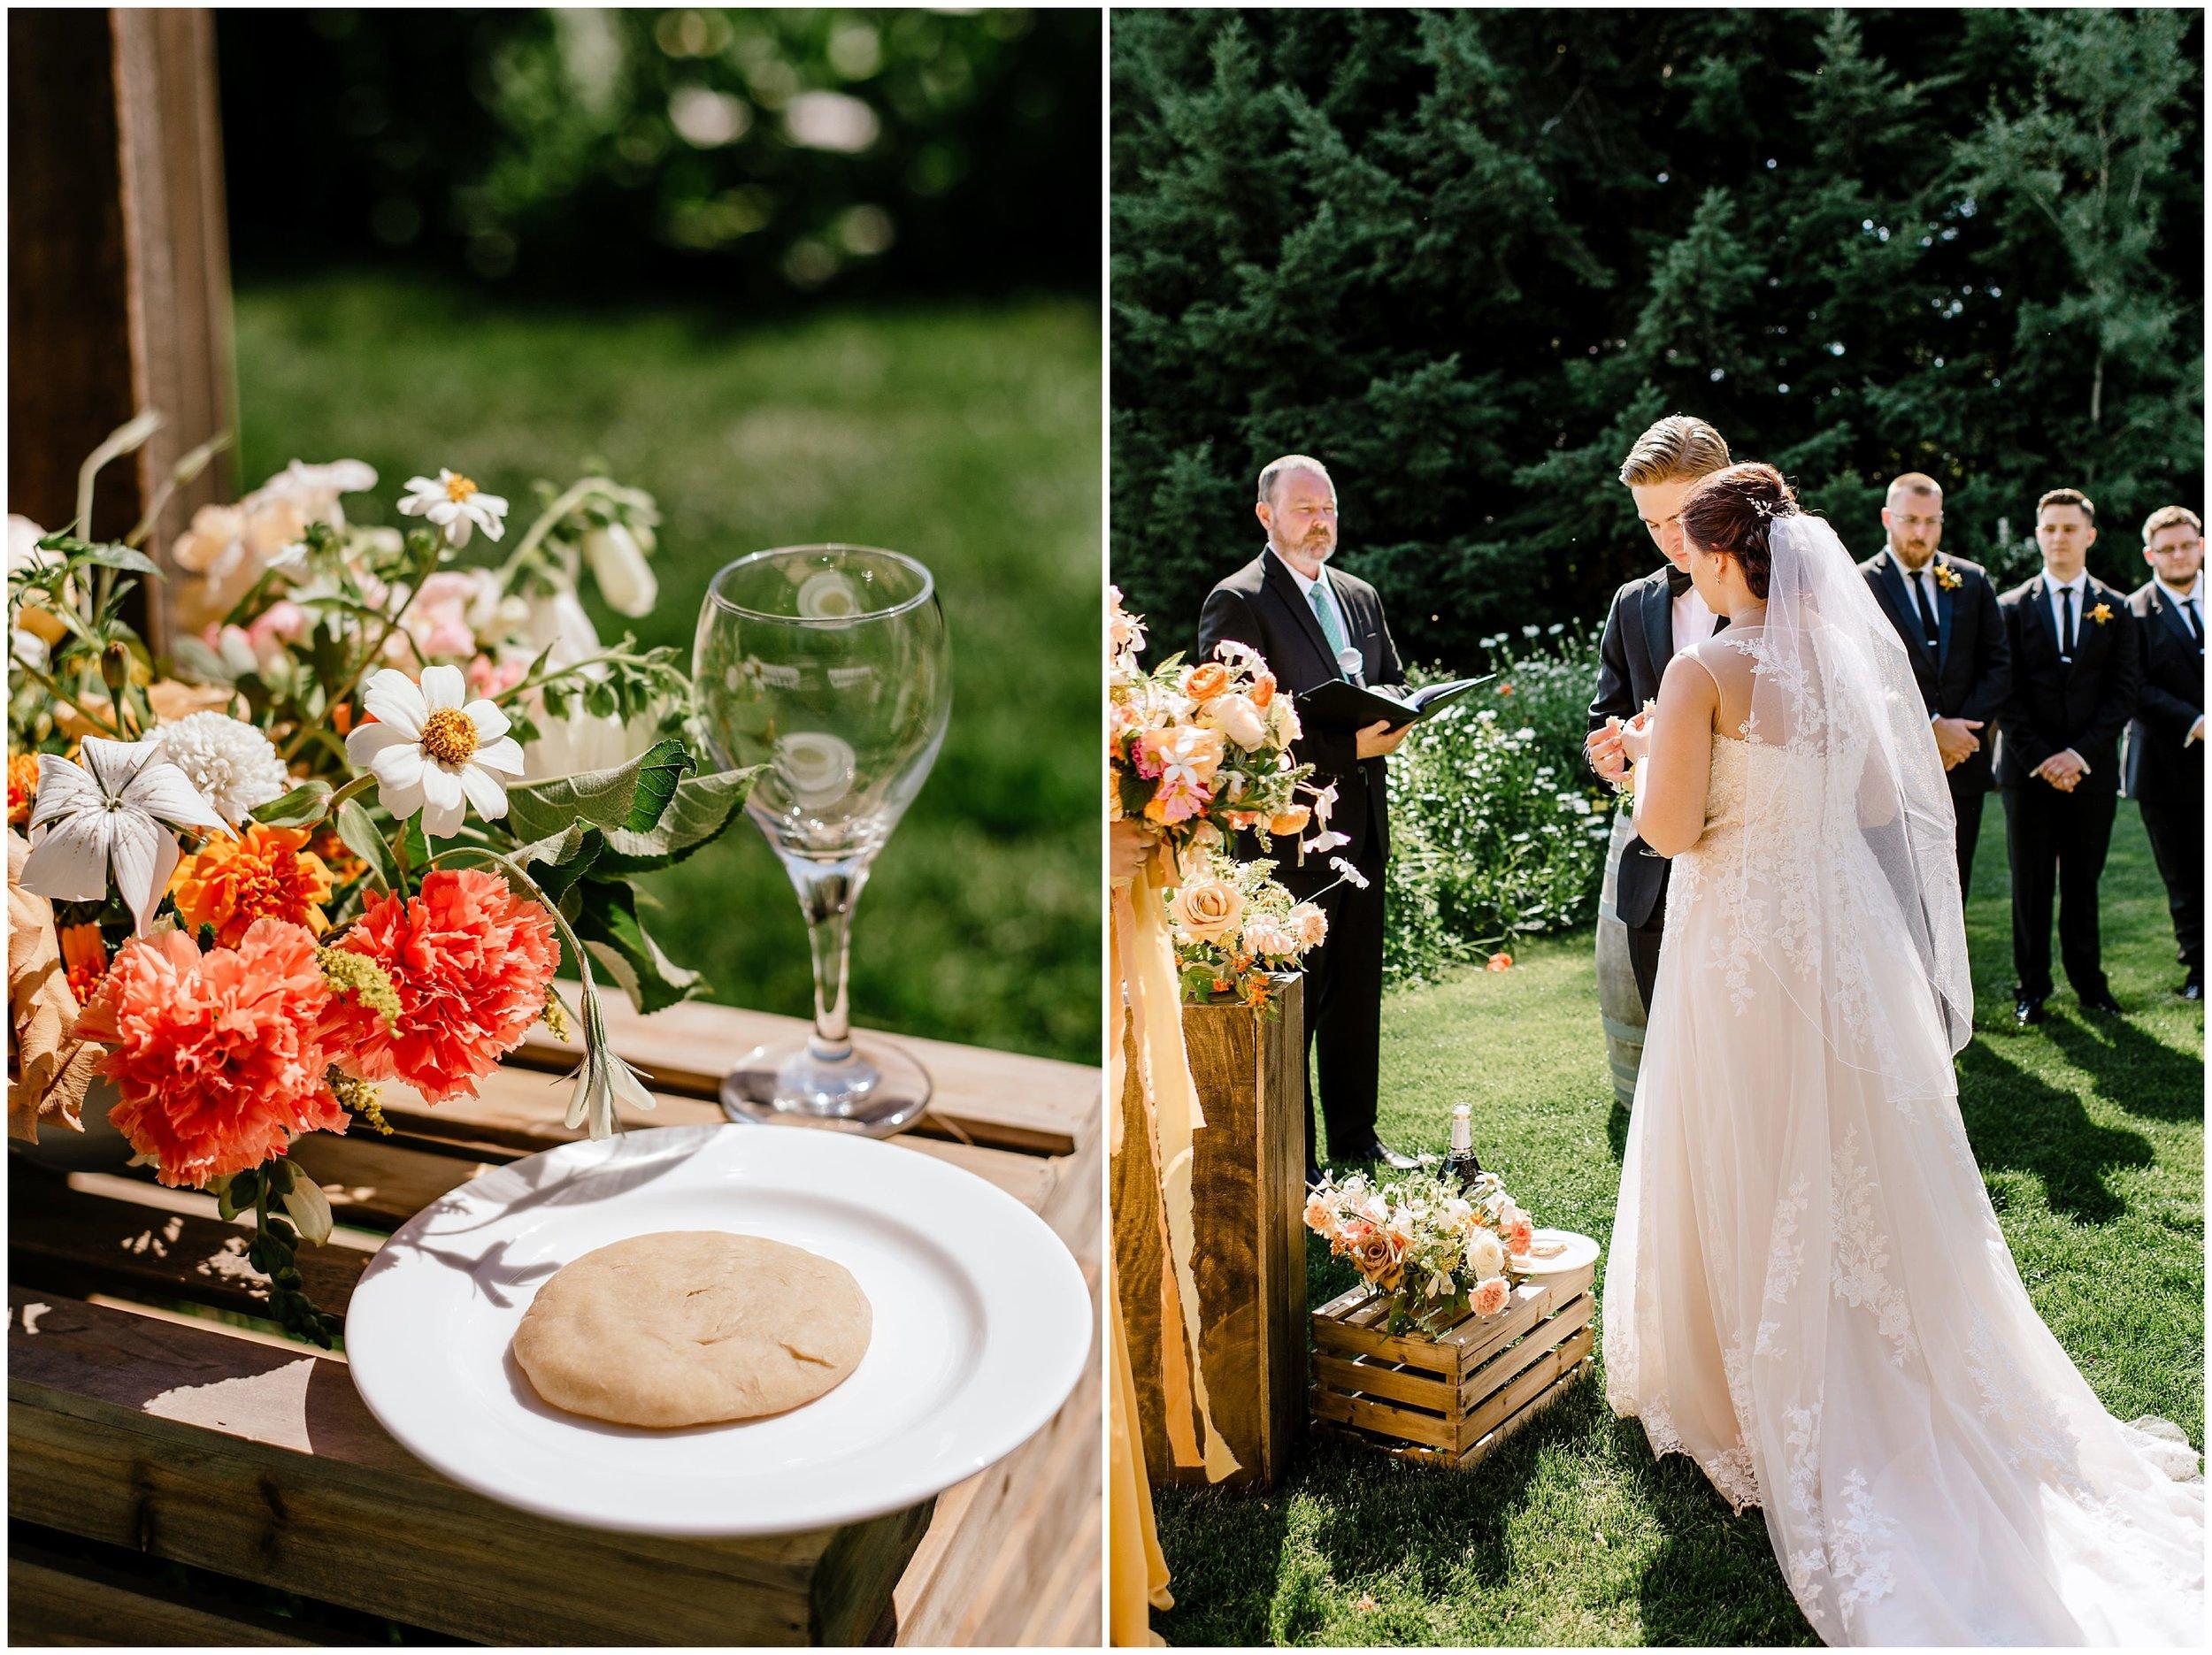 Citrus-inspired-wedding-at-Gorge-Crest-Vineyard-204.jpg